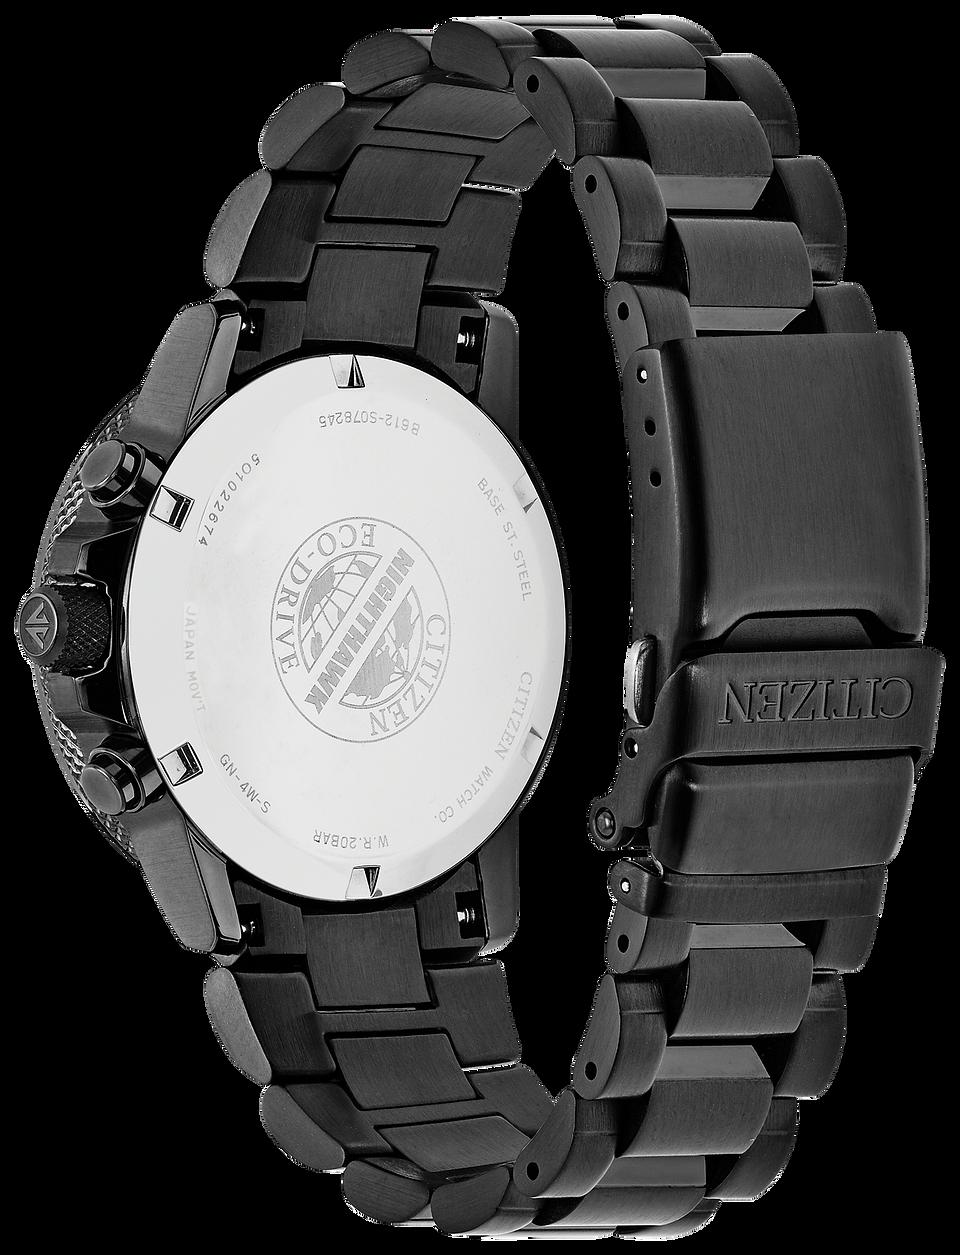 d874432da43 Nighthawk - Men s Eco-Drive CA0295-58E Chronograph Watch